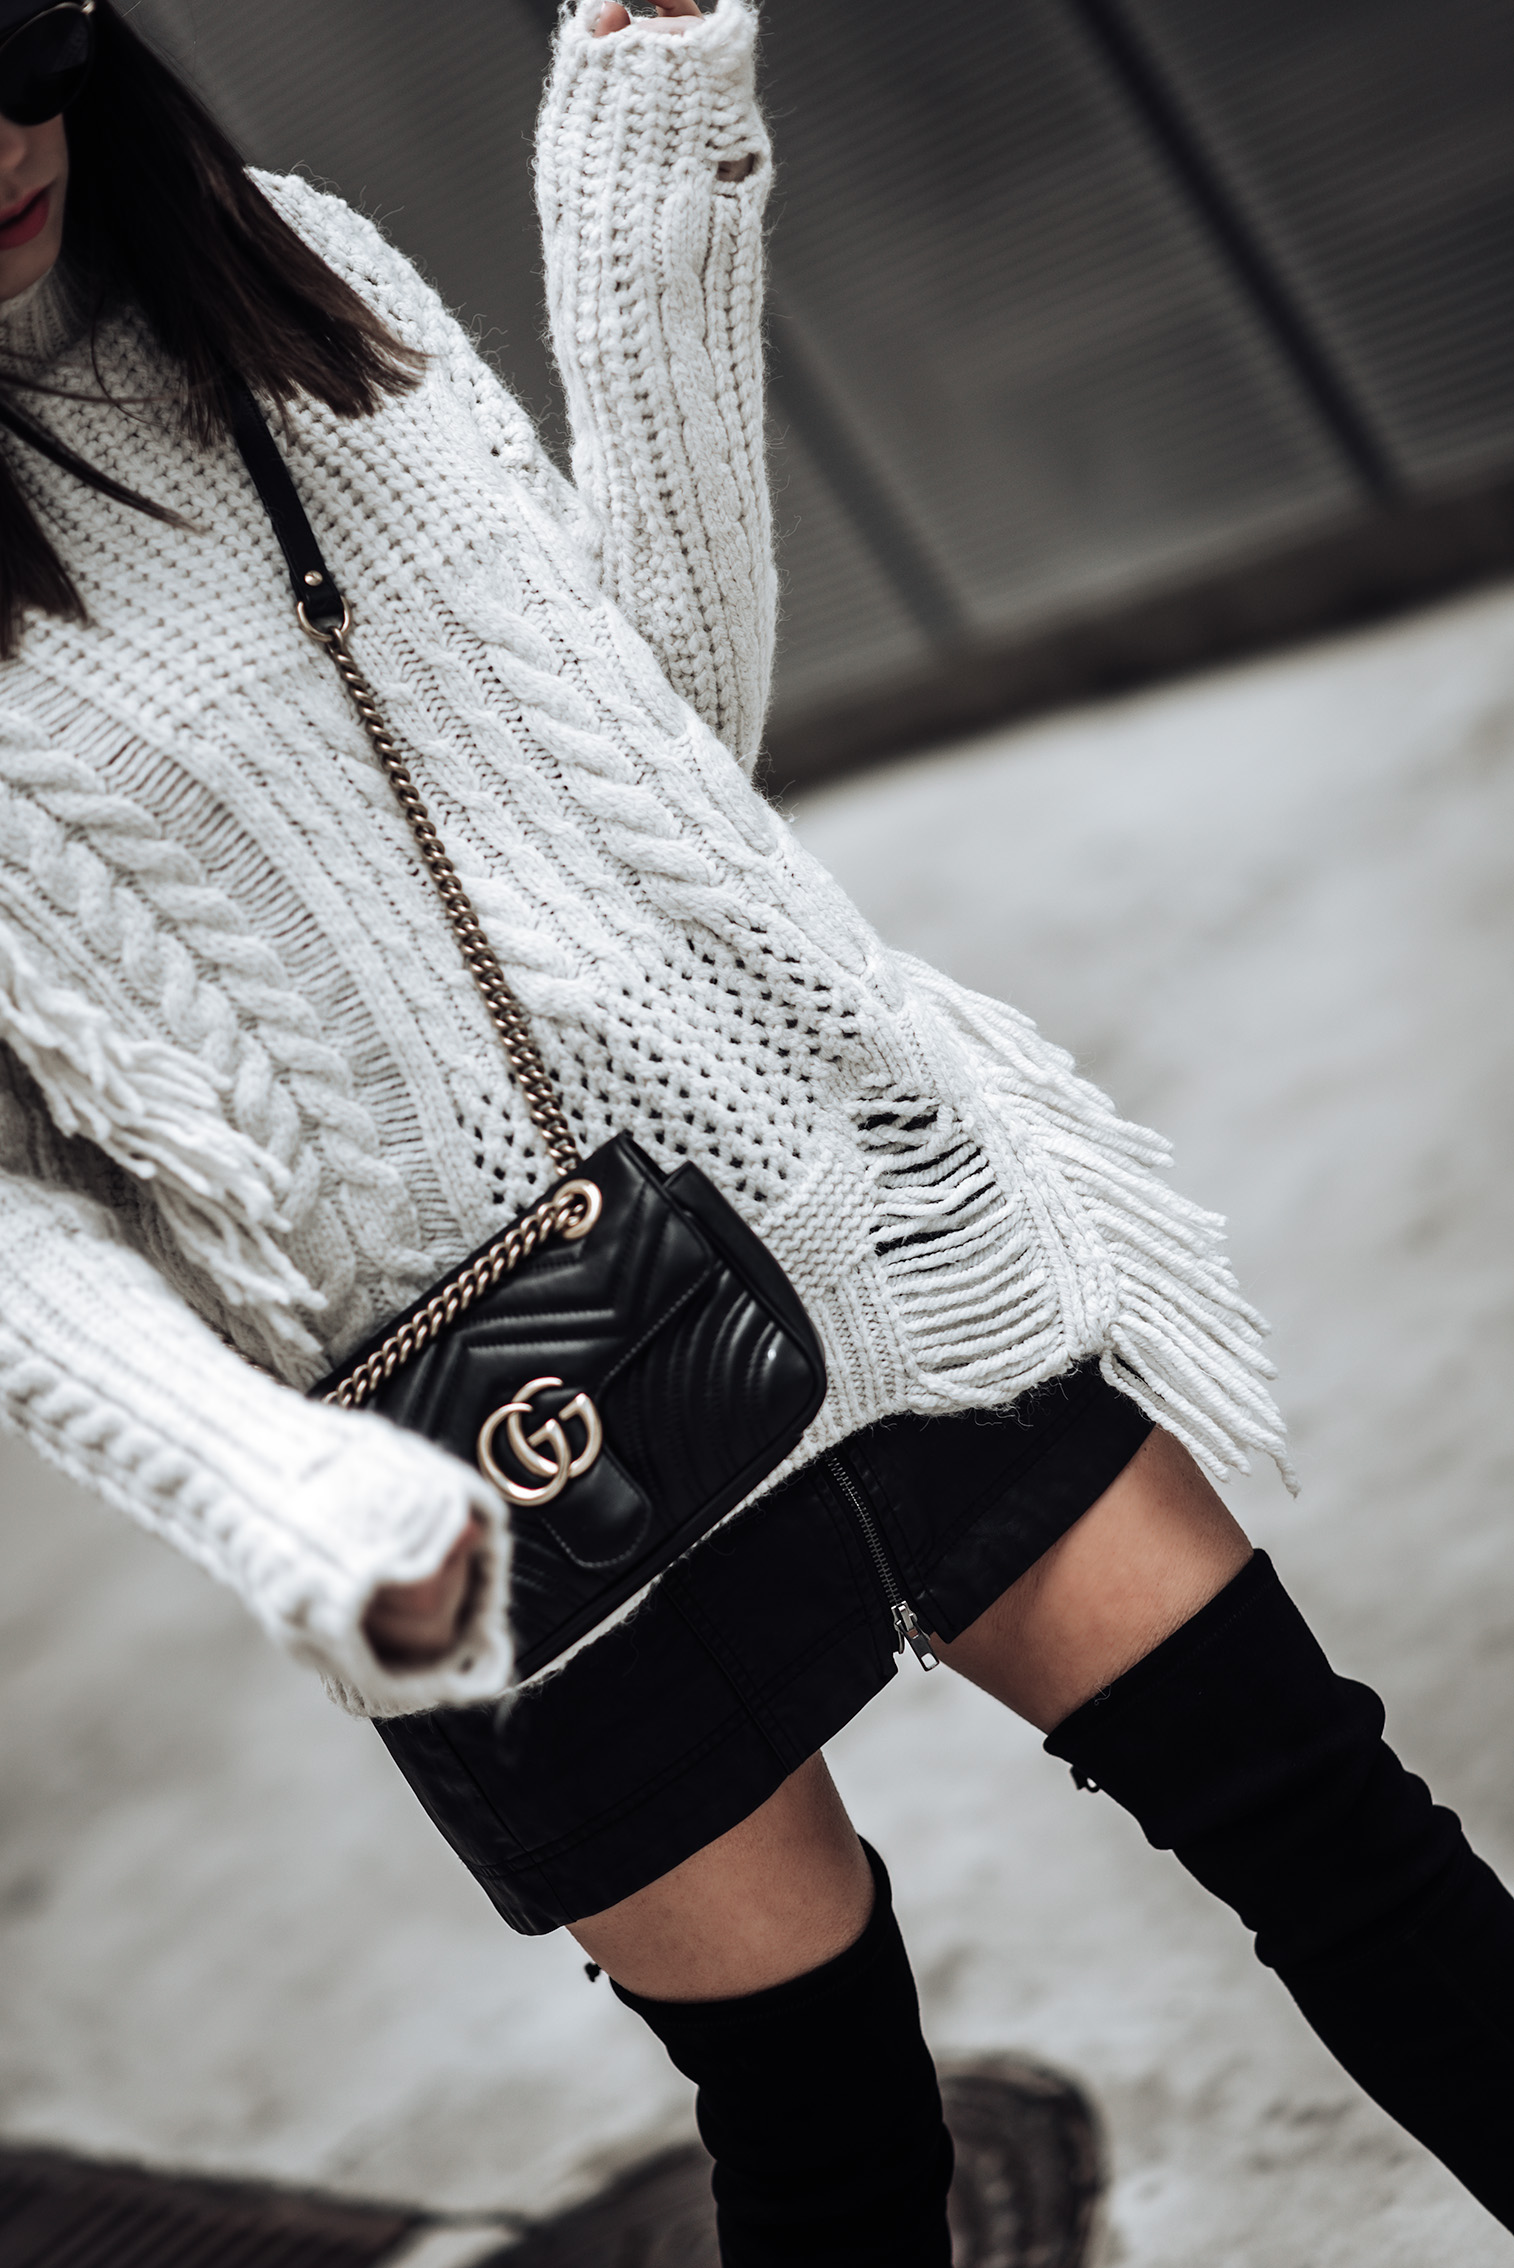 Texture   Chunky Cable Knit Sweater   Free People Vegan Mini skirt   Gucci Marmont Bag   Stuart Weitzman Funland Boots   #streetstyle #fashionblog #liketkit